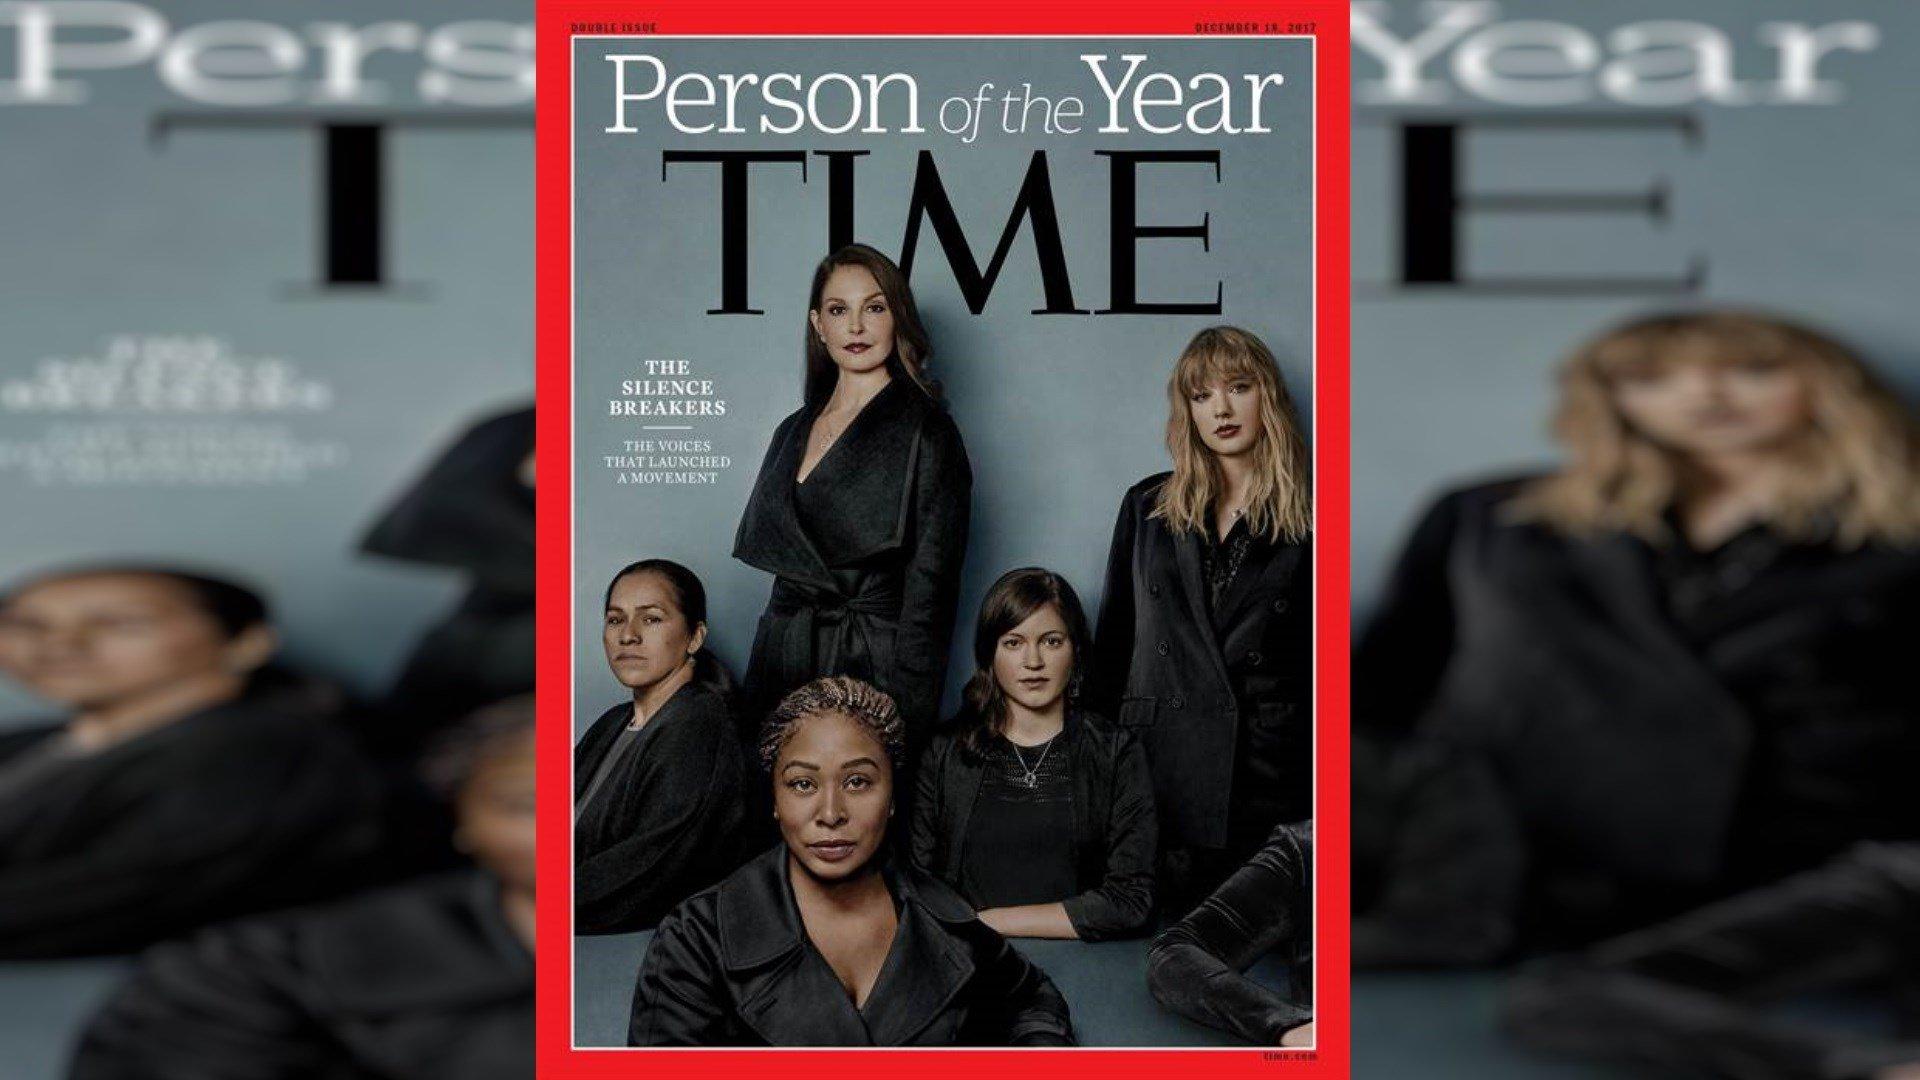 Photo: Time Magazine